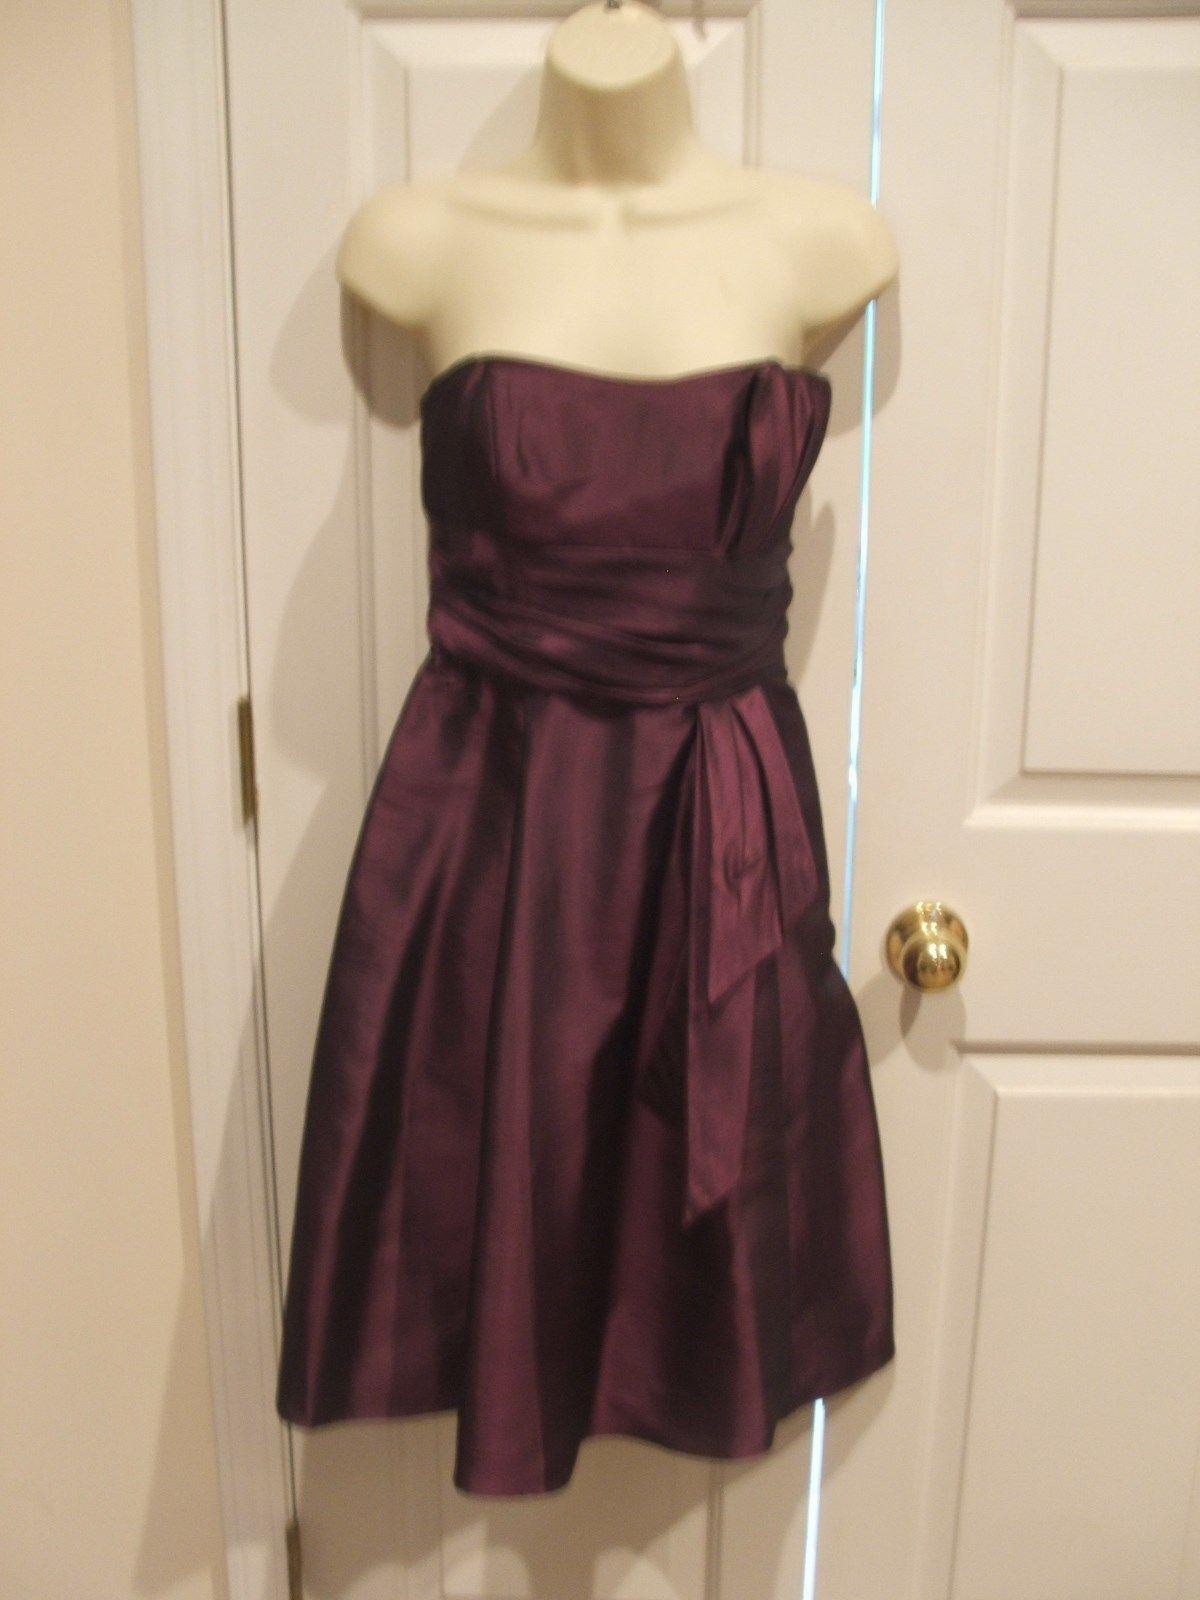 NWT London Style Nights Straplesss EGGPLANT Formal Occasion Dress siz 4